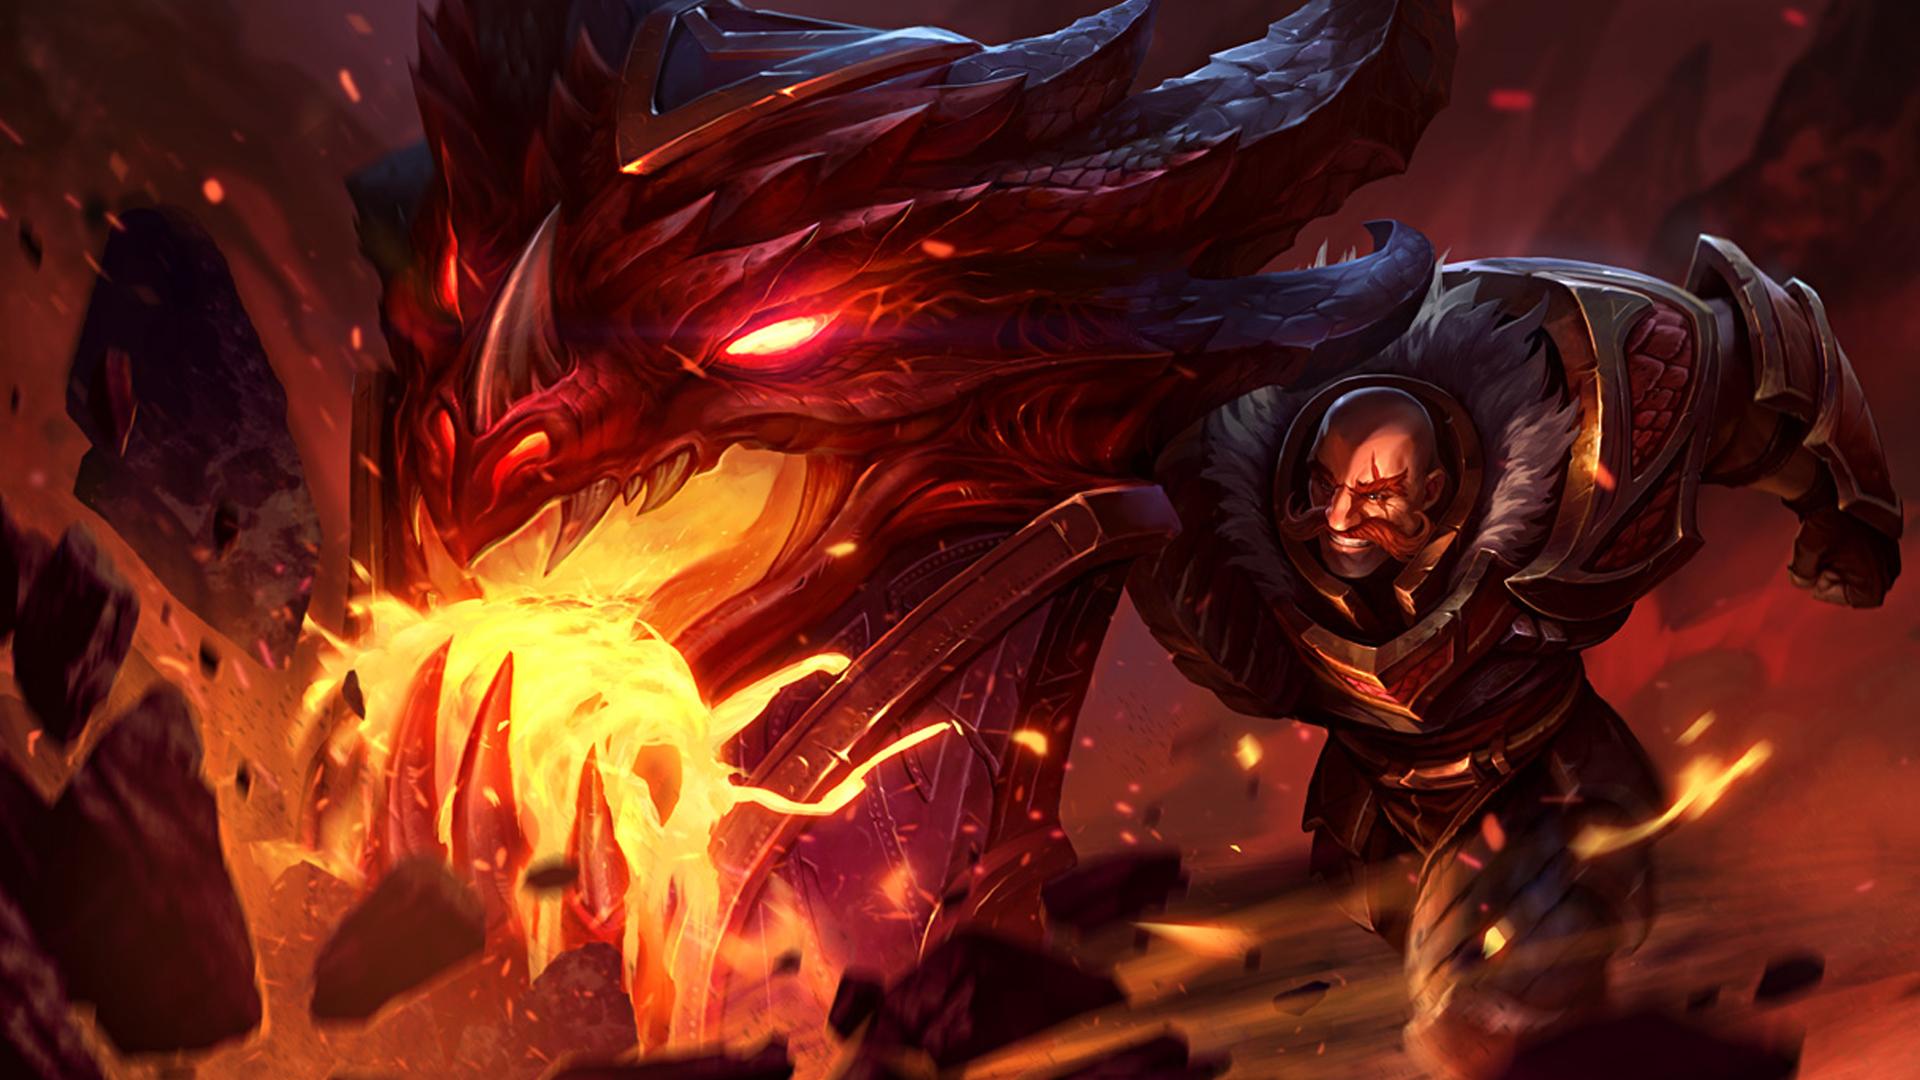 braum dragonslayer skin splash art league of legends lol hd game